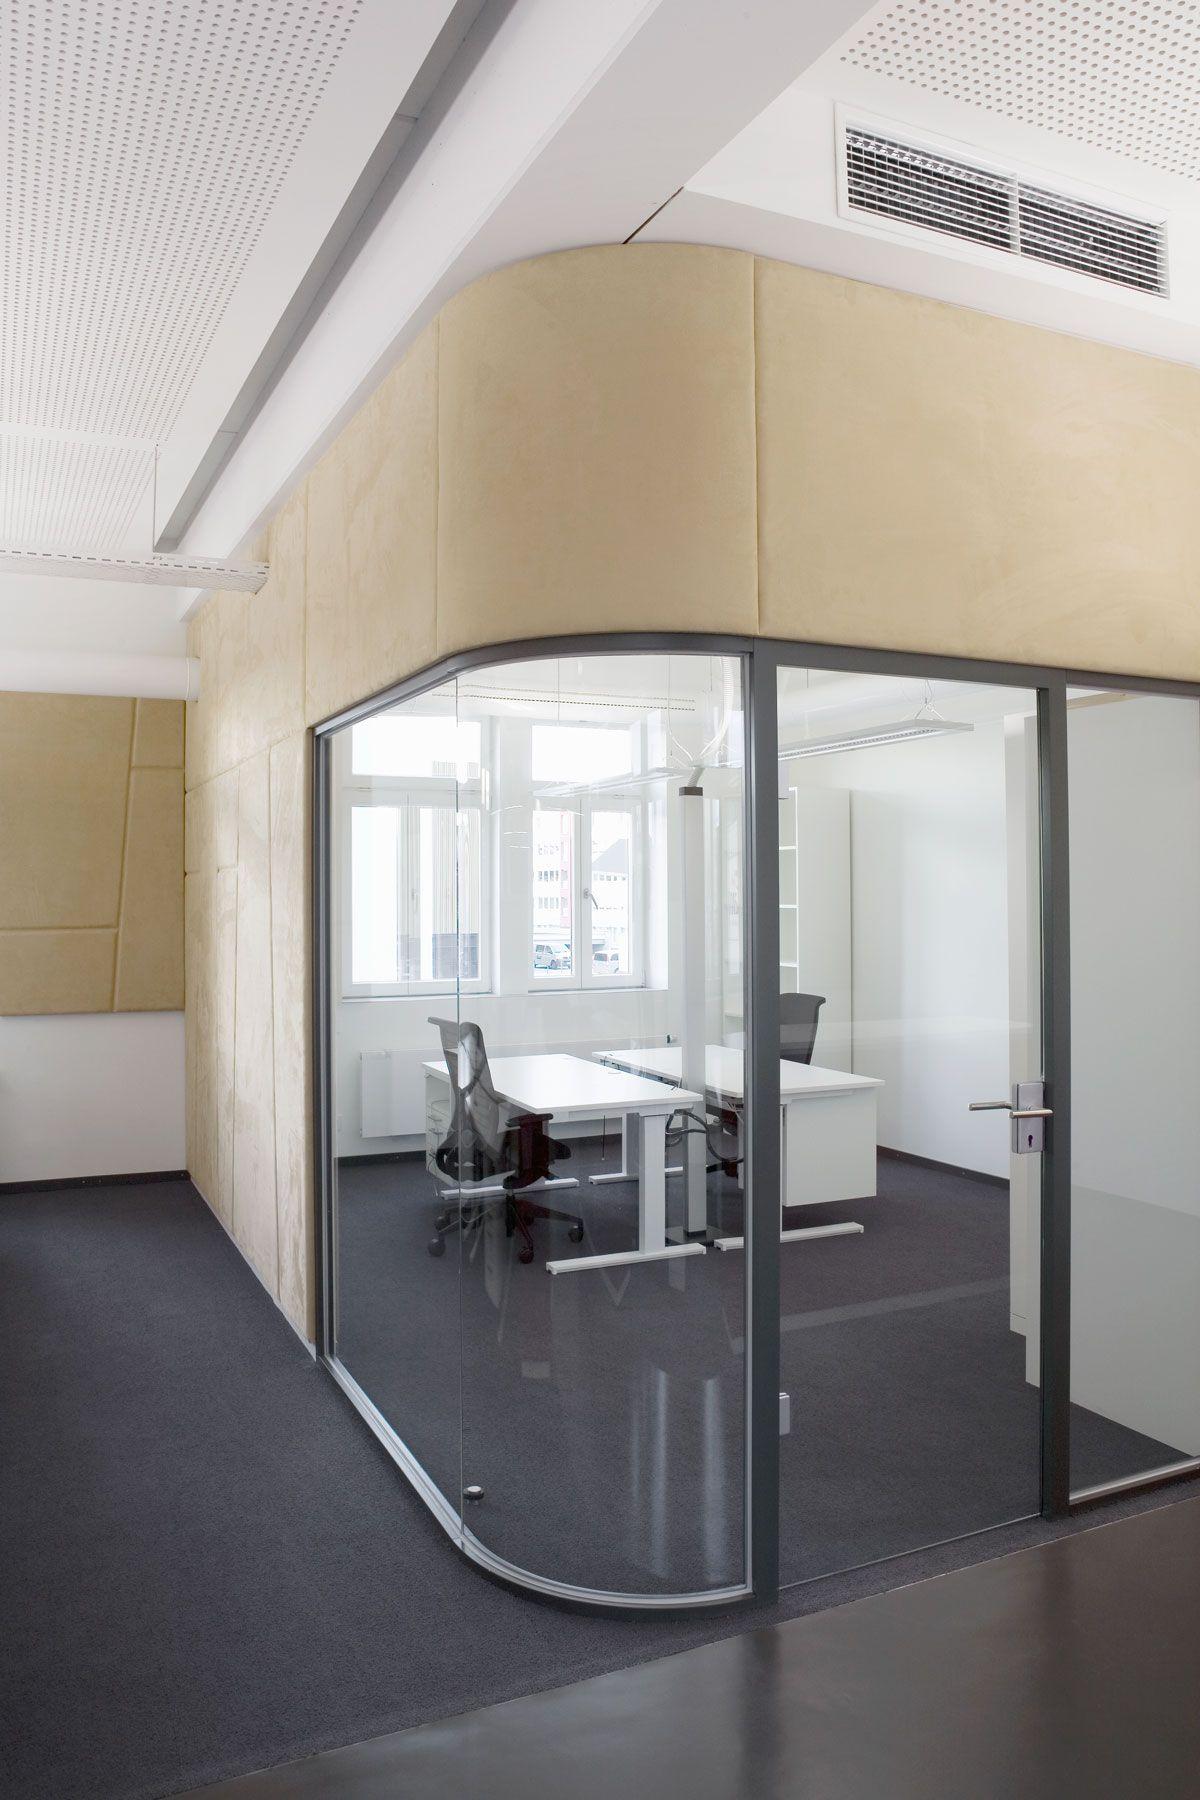 Architekt Ludwigsburg architecture interior design corporate office glass wall wood